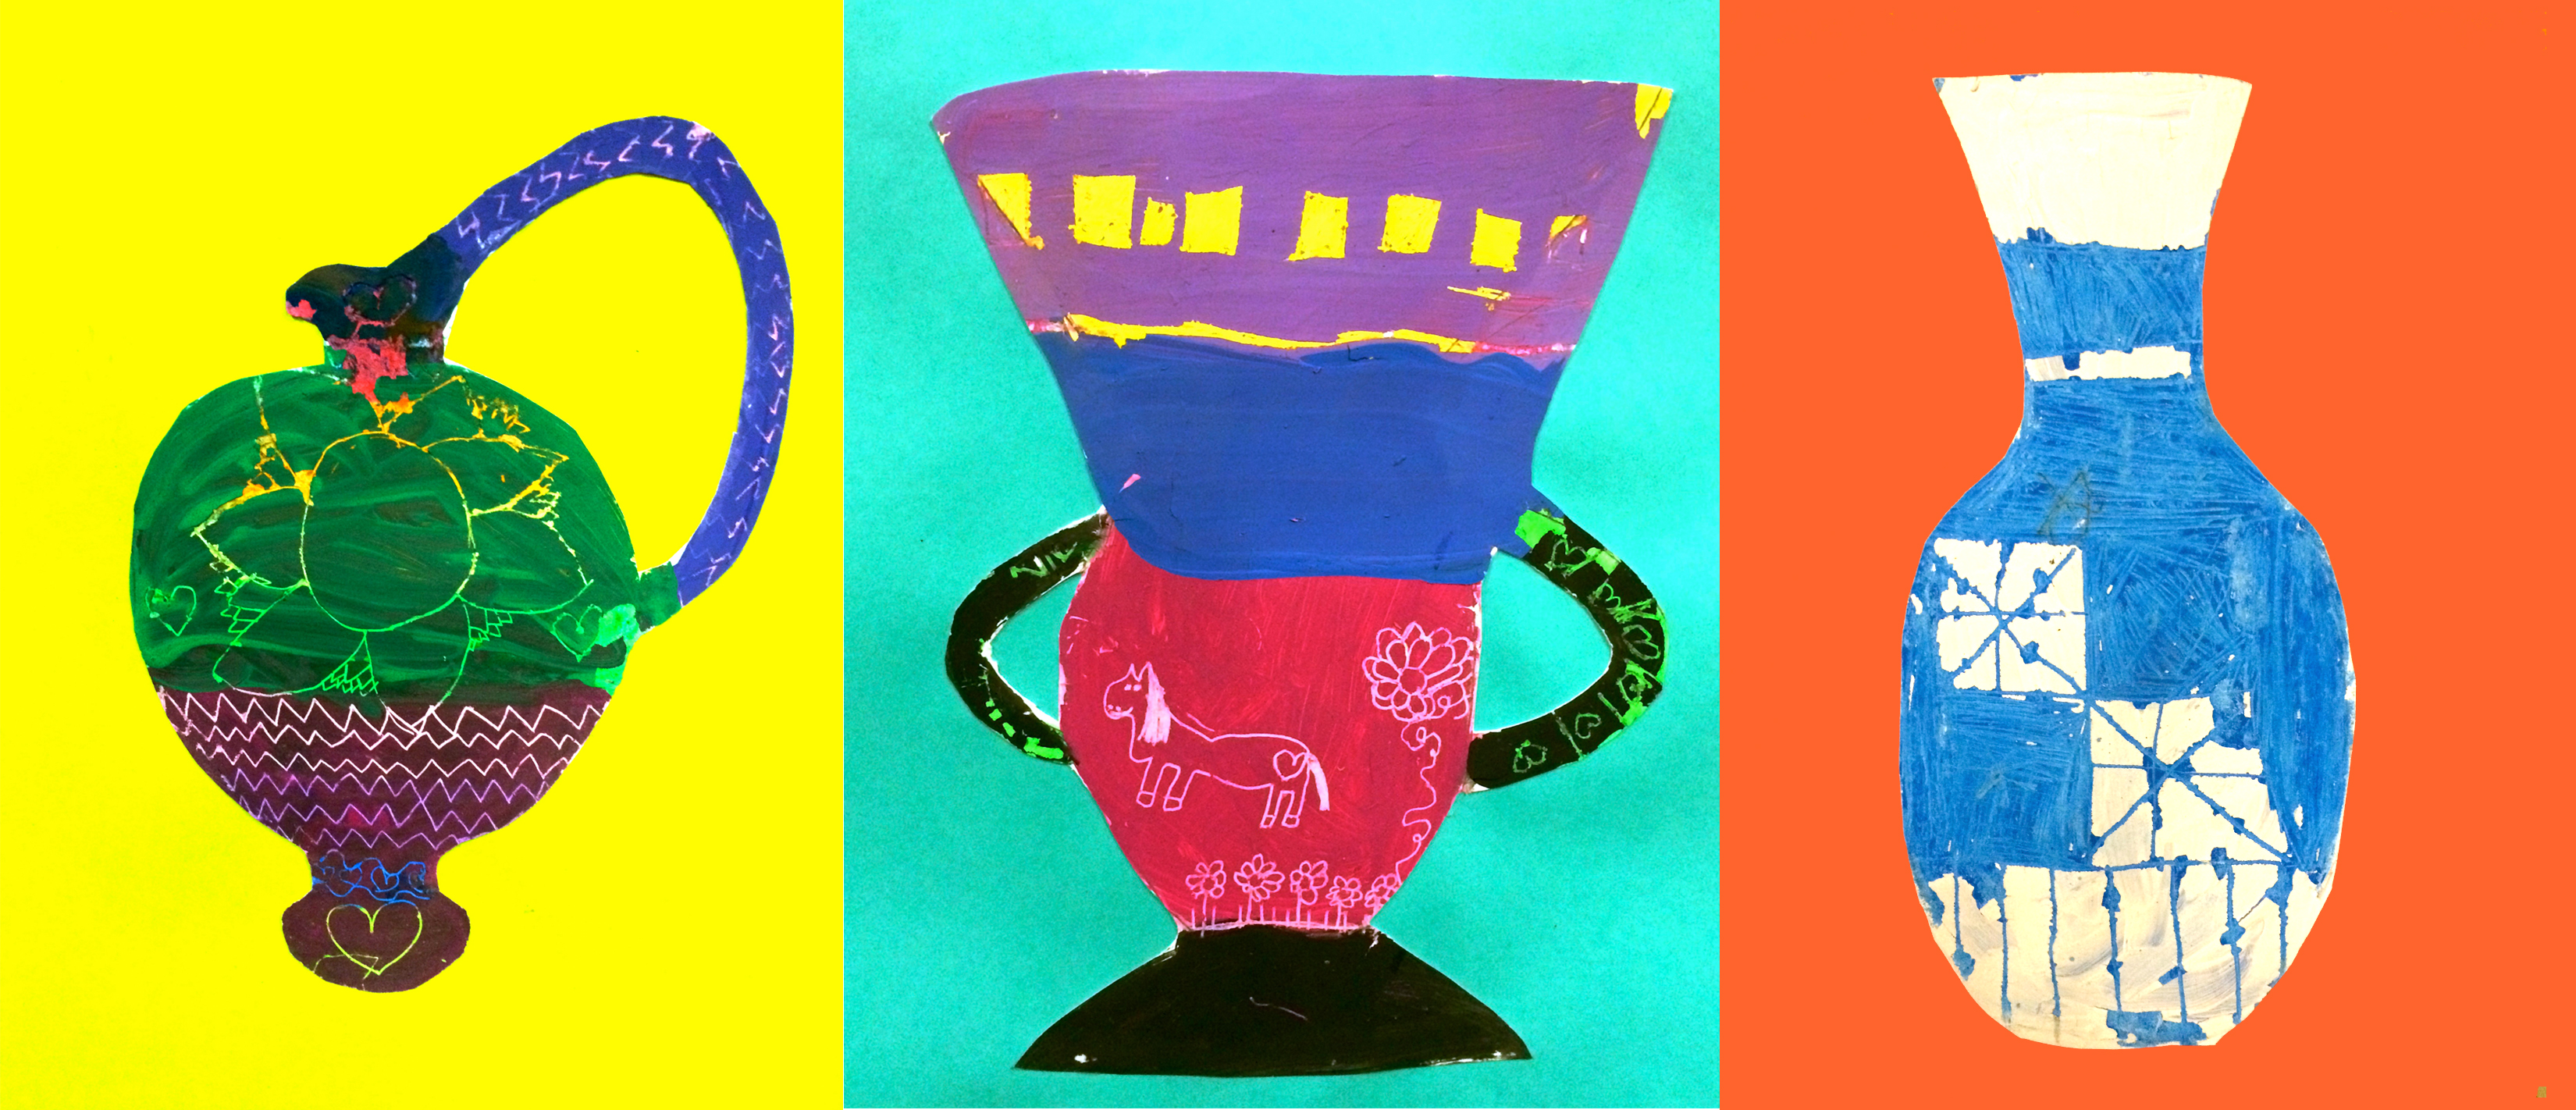 Vases. Mixed Media, acrylic paint/pastel carvings. (Grade: 2)